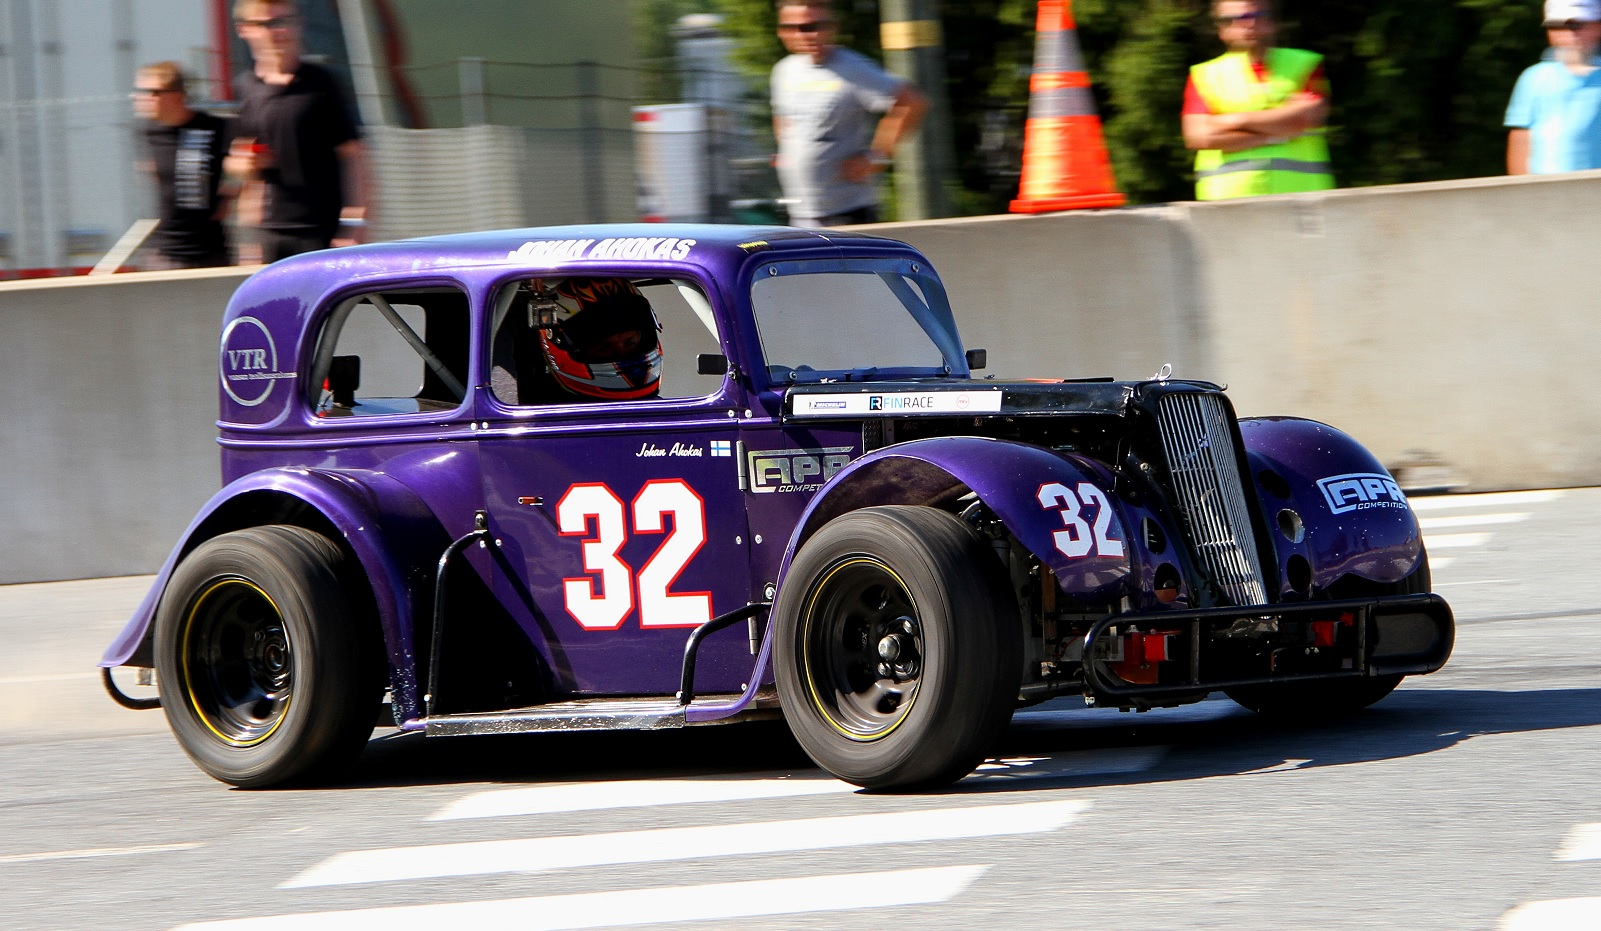 Legends Race Cars Top Speed